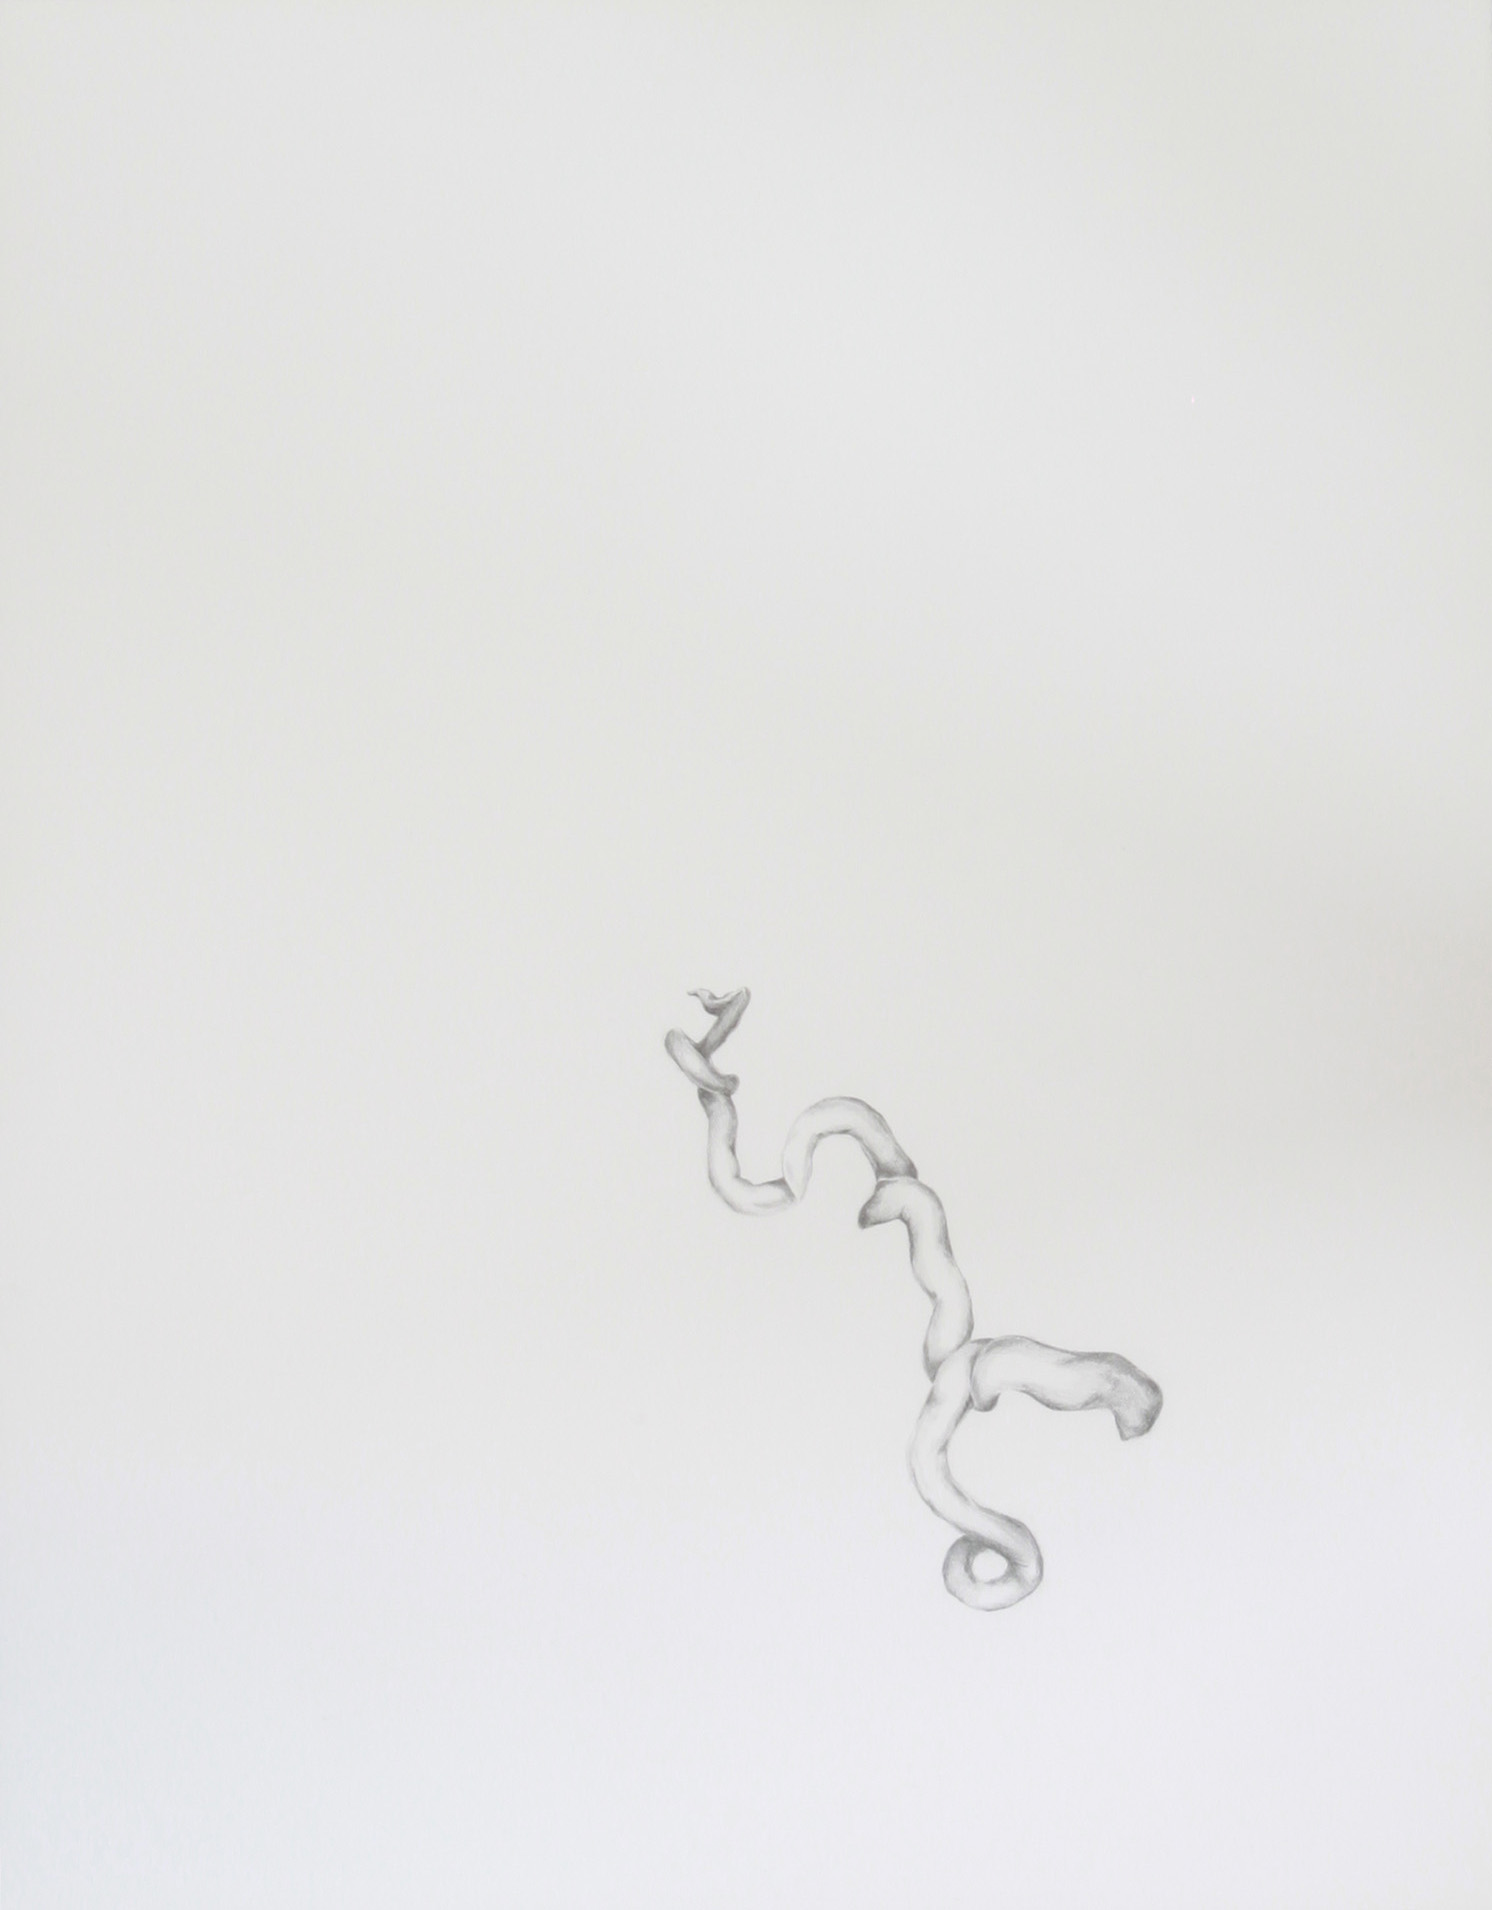 laocoon_drawing.jpg